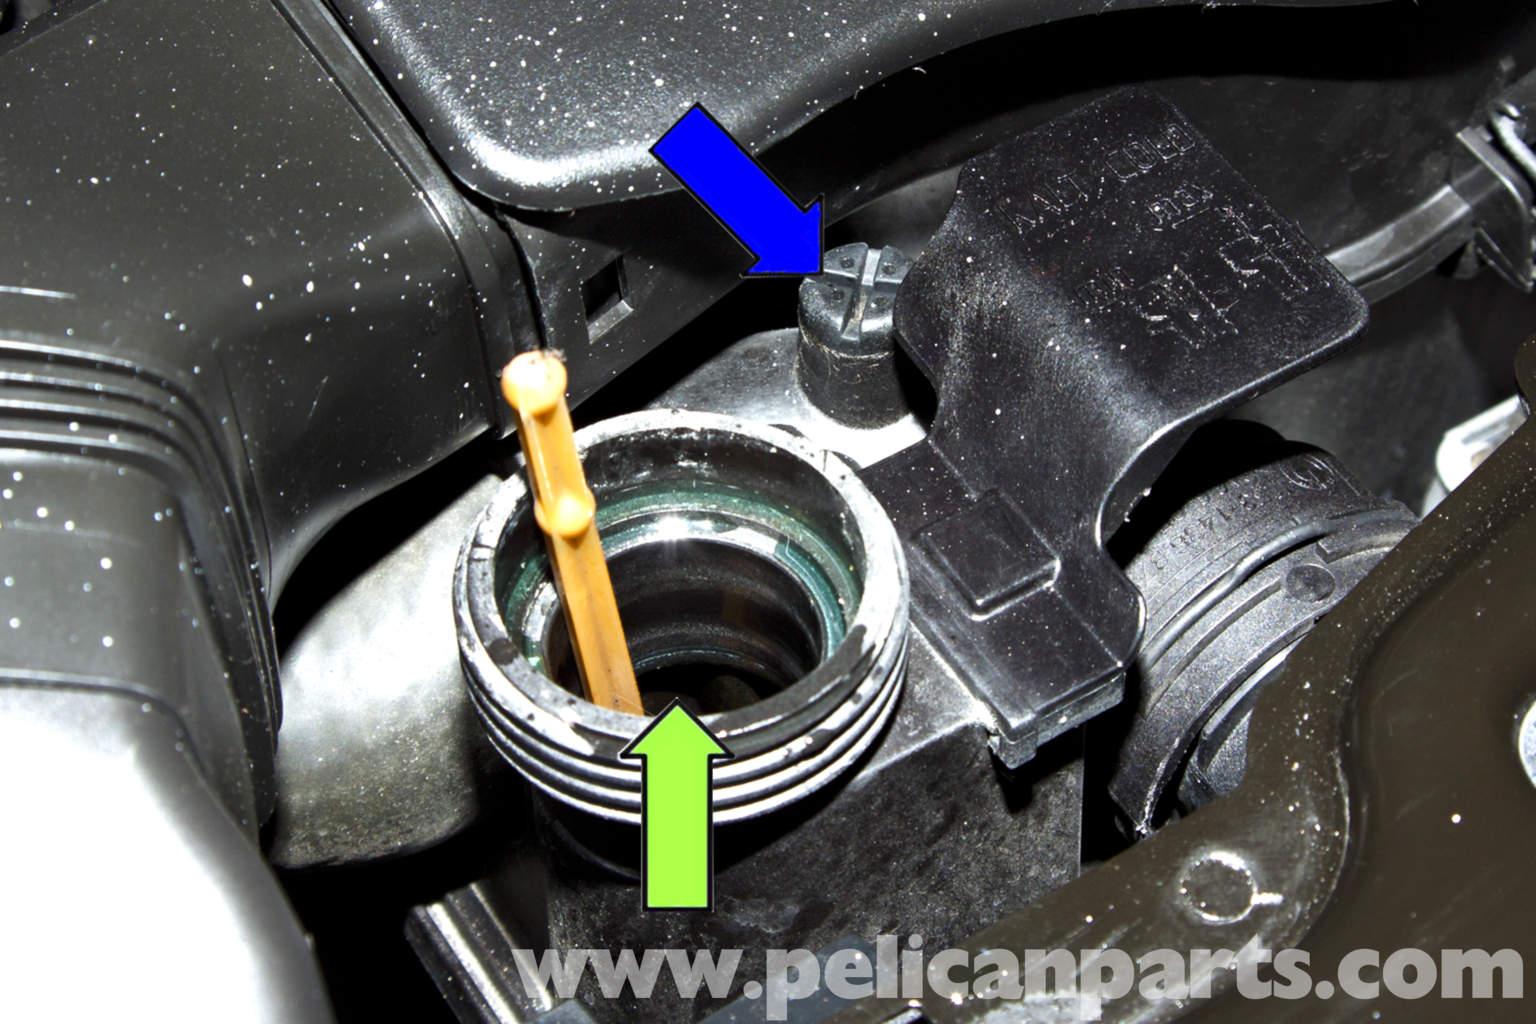 catalog realoem frame com showparts radiator enus diag bmw parts online